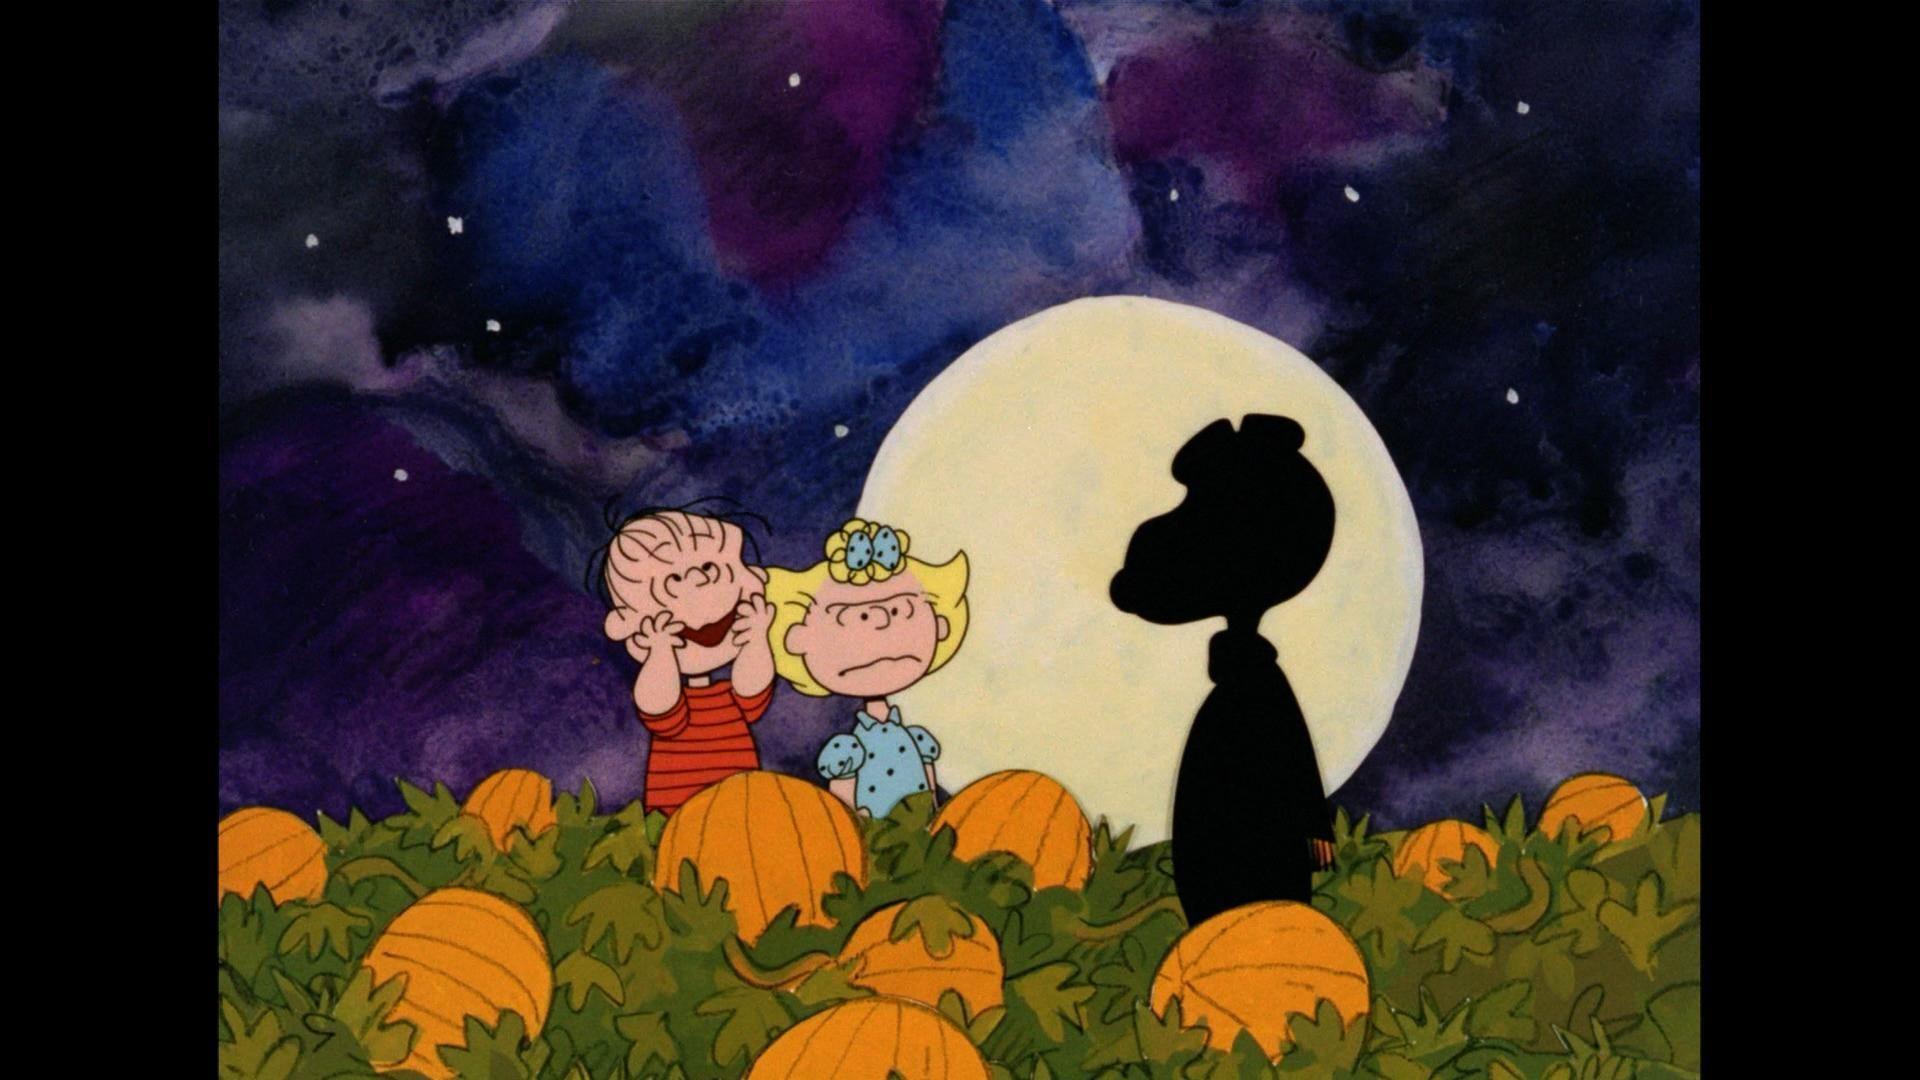 Snoopy Halloween wallpaper